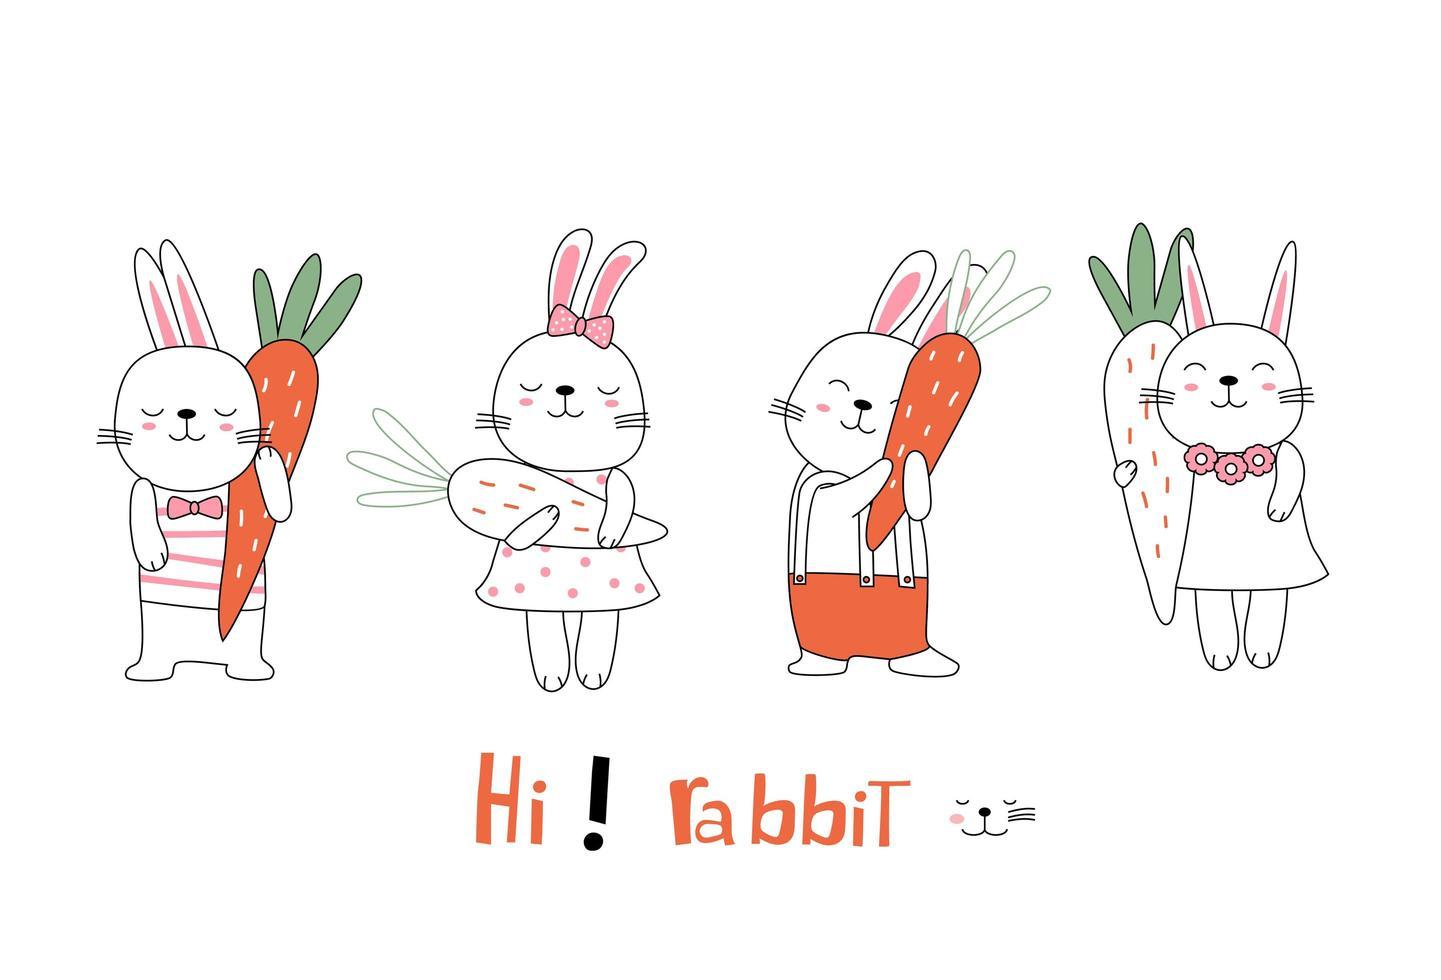 dibujado a mano linda postura conejitos con zanahorias vector